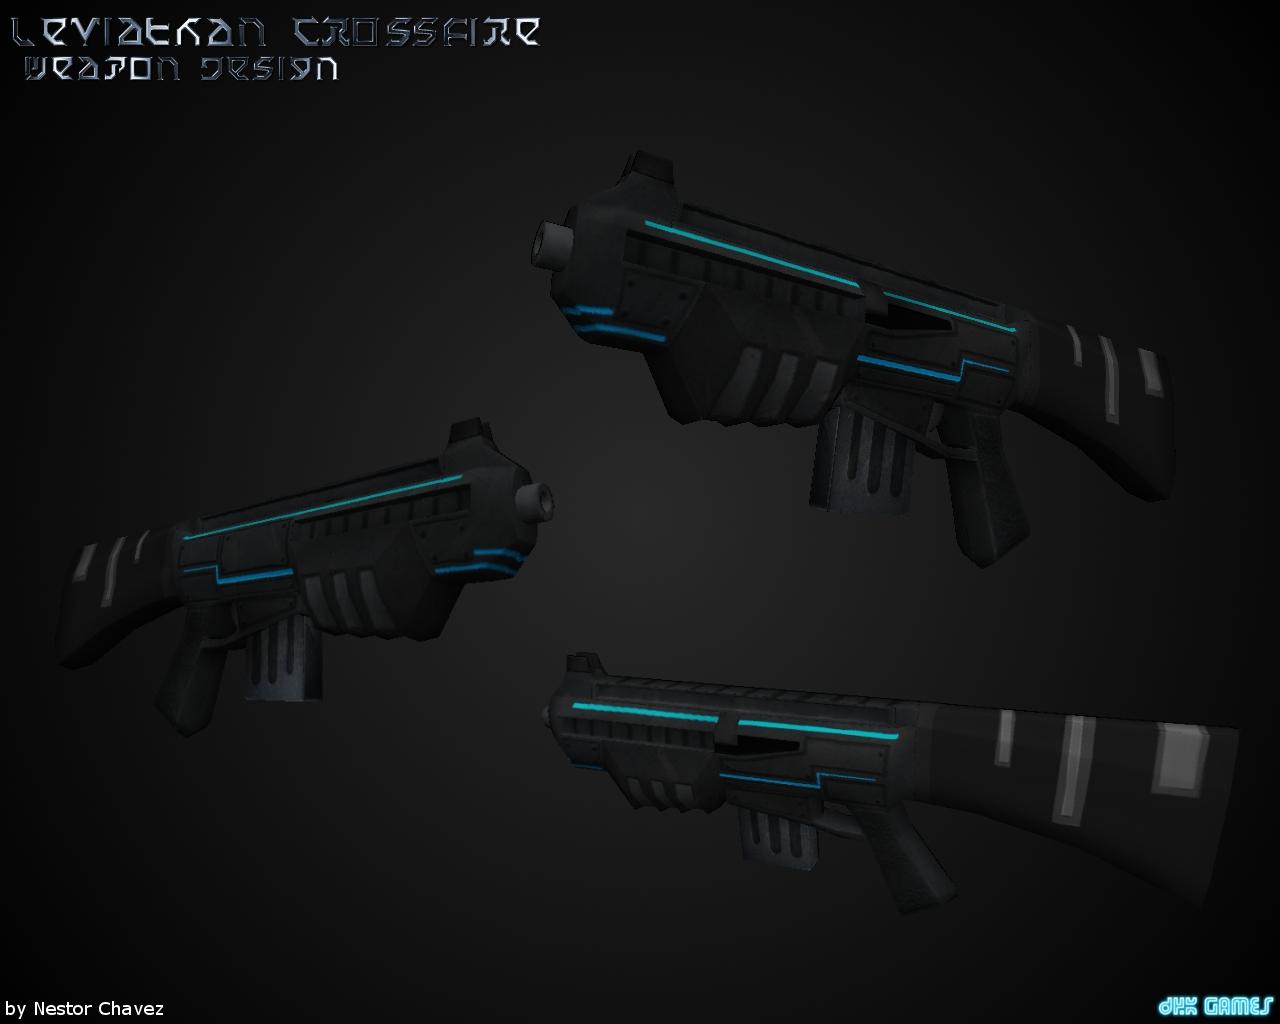 New Guns Designs And Mid-range Laser Gun